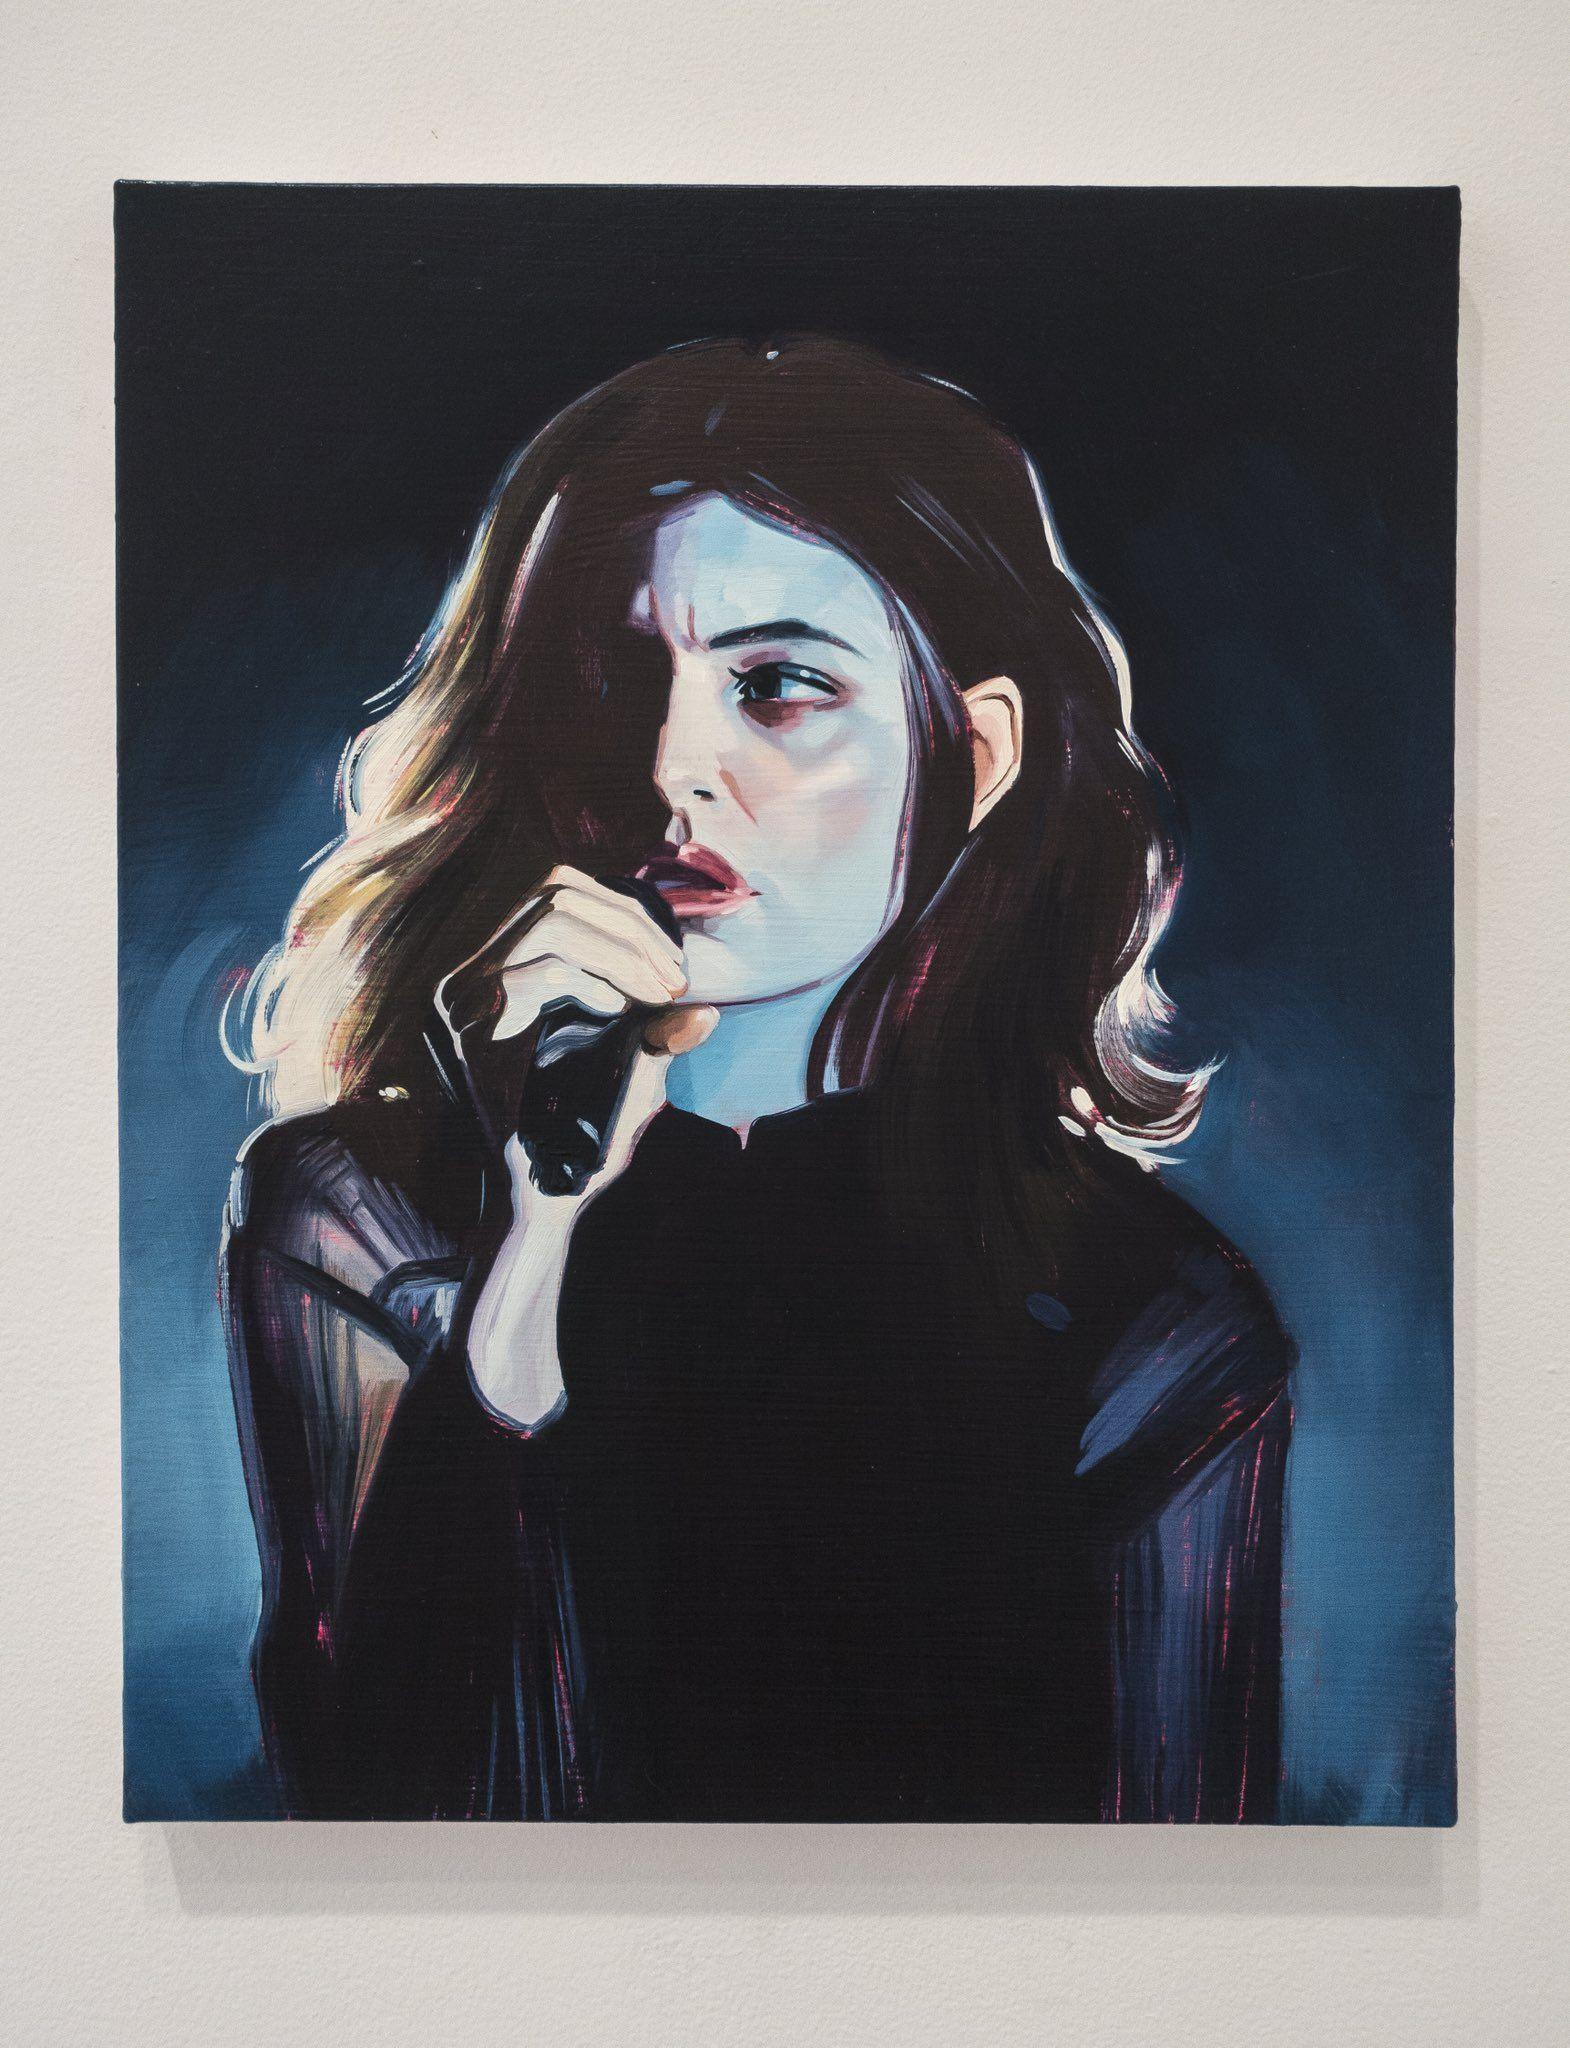 Twitter | Lorde album, Lorde, Album cover art